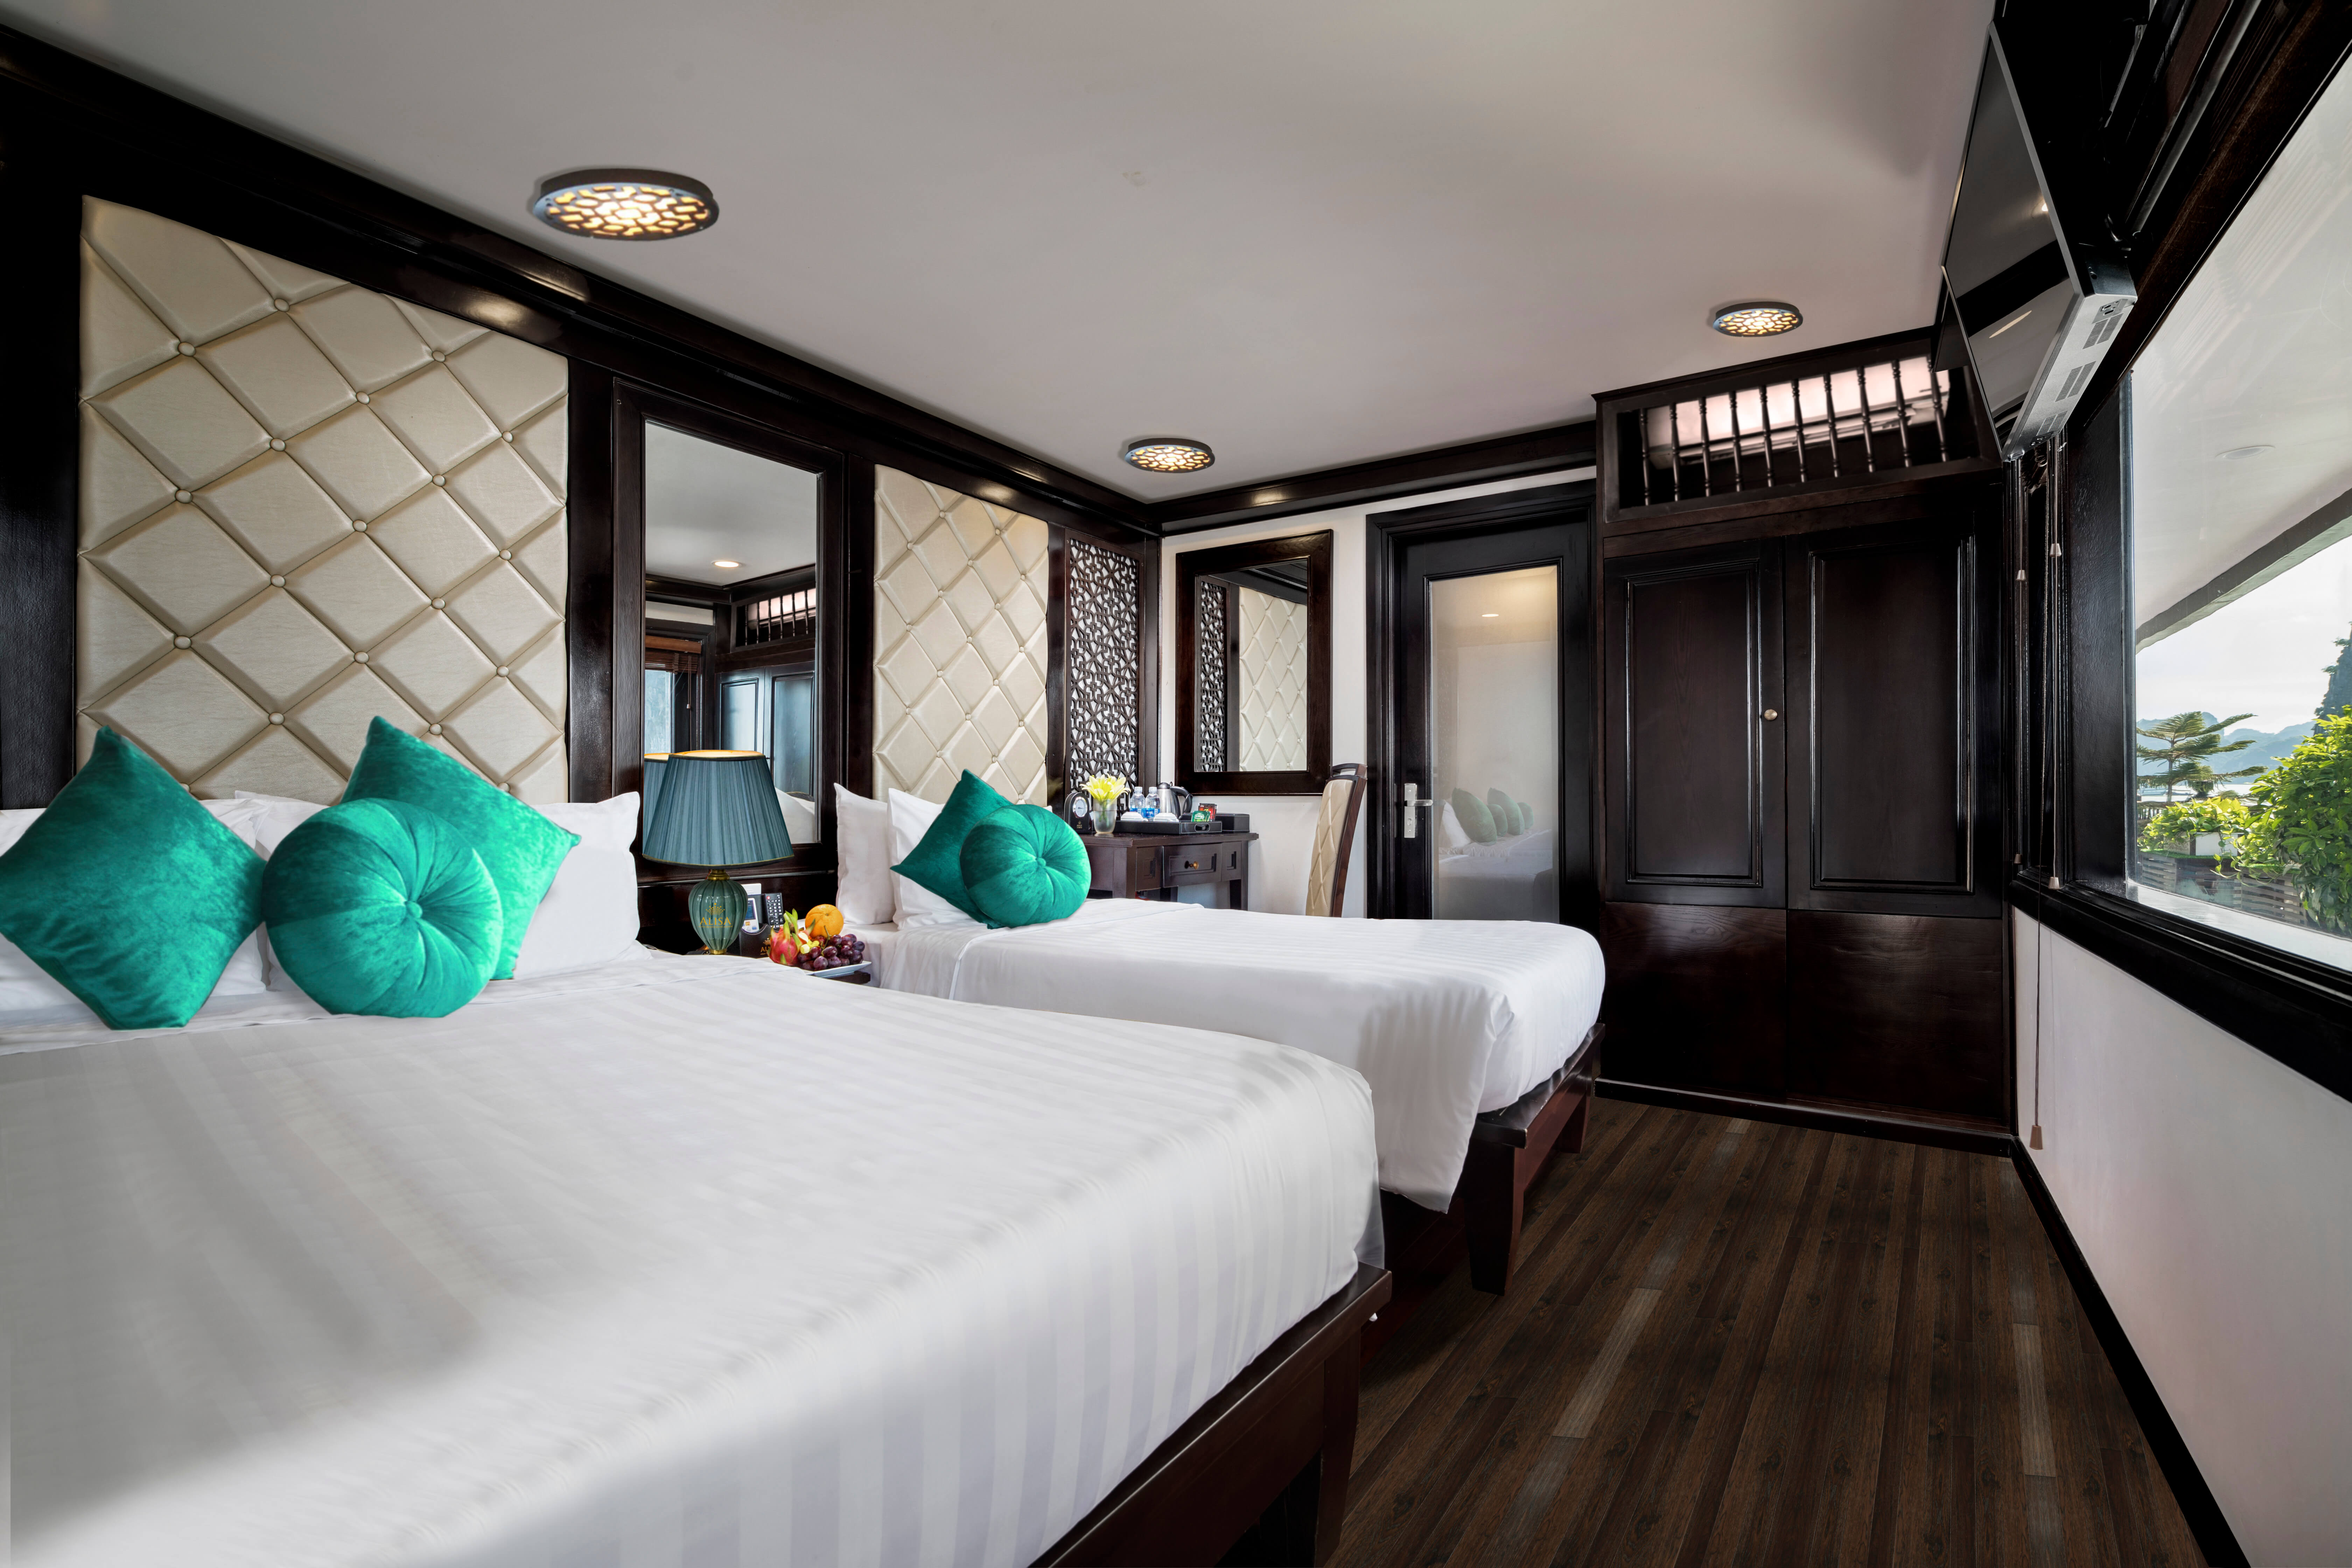 alisa premium cruise halong bay over night cruise